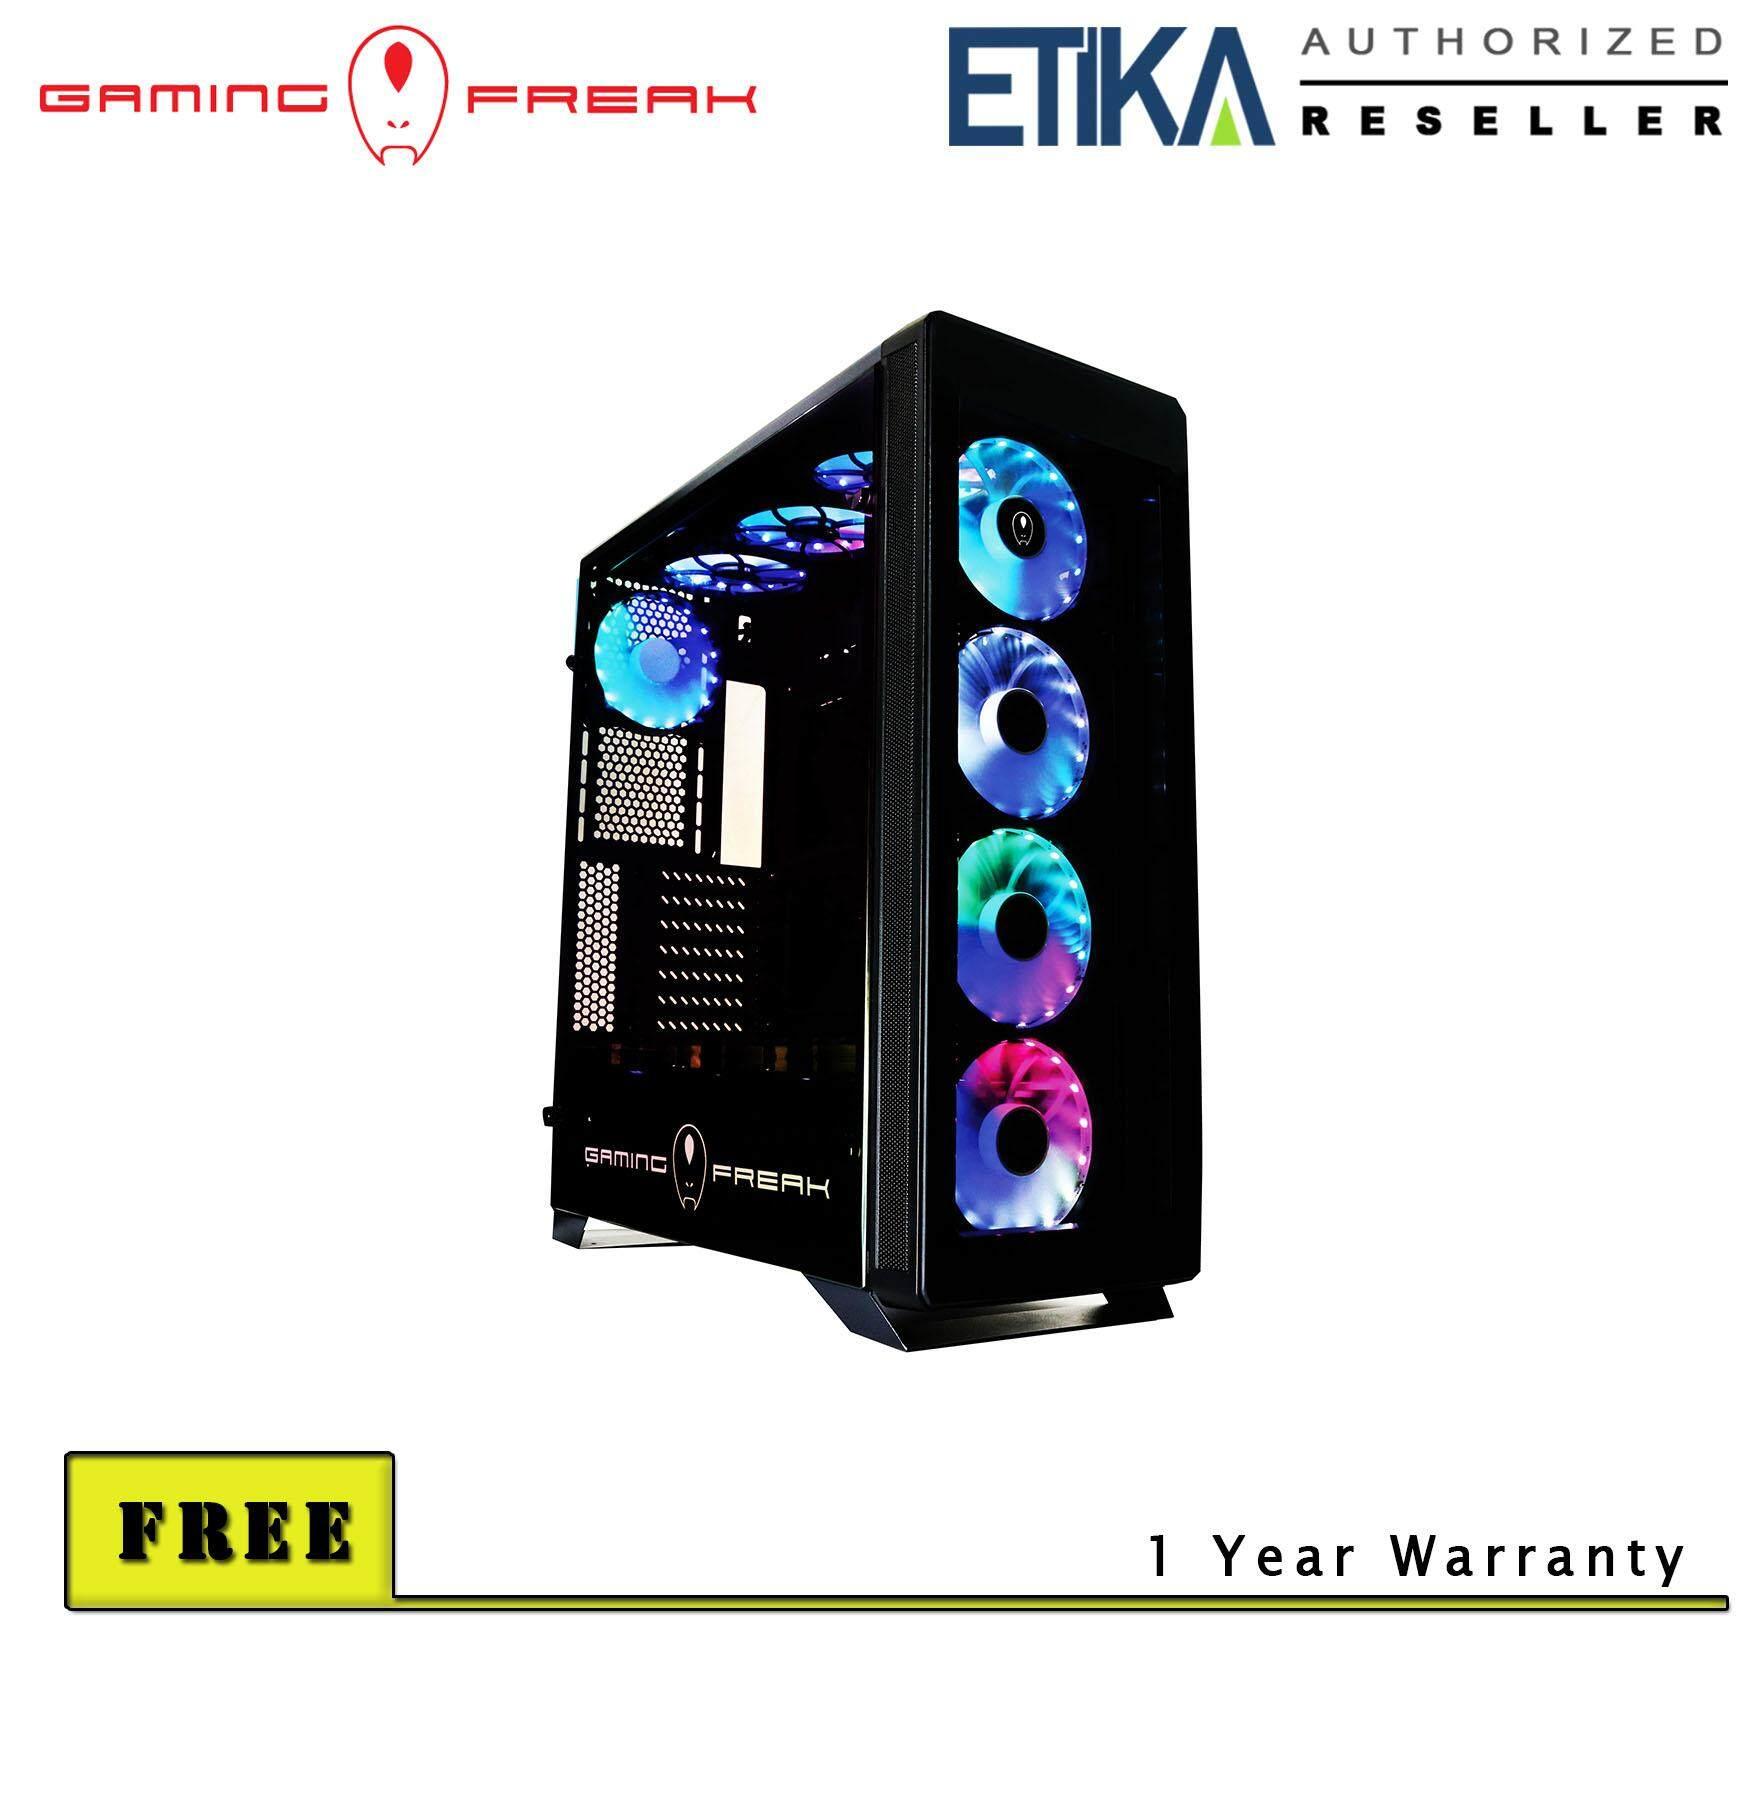 Gaming Freak Aura 980G Premium Middle Tower Case Malaysia